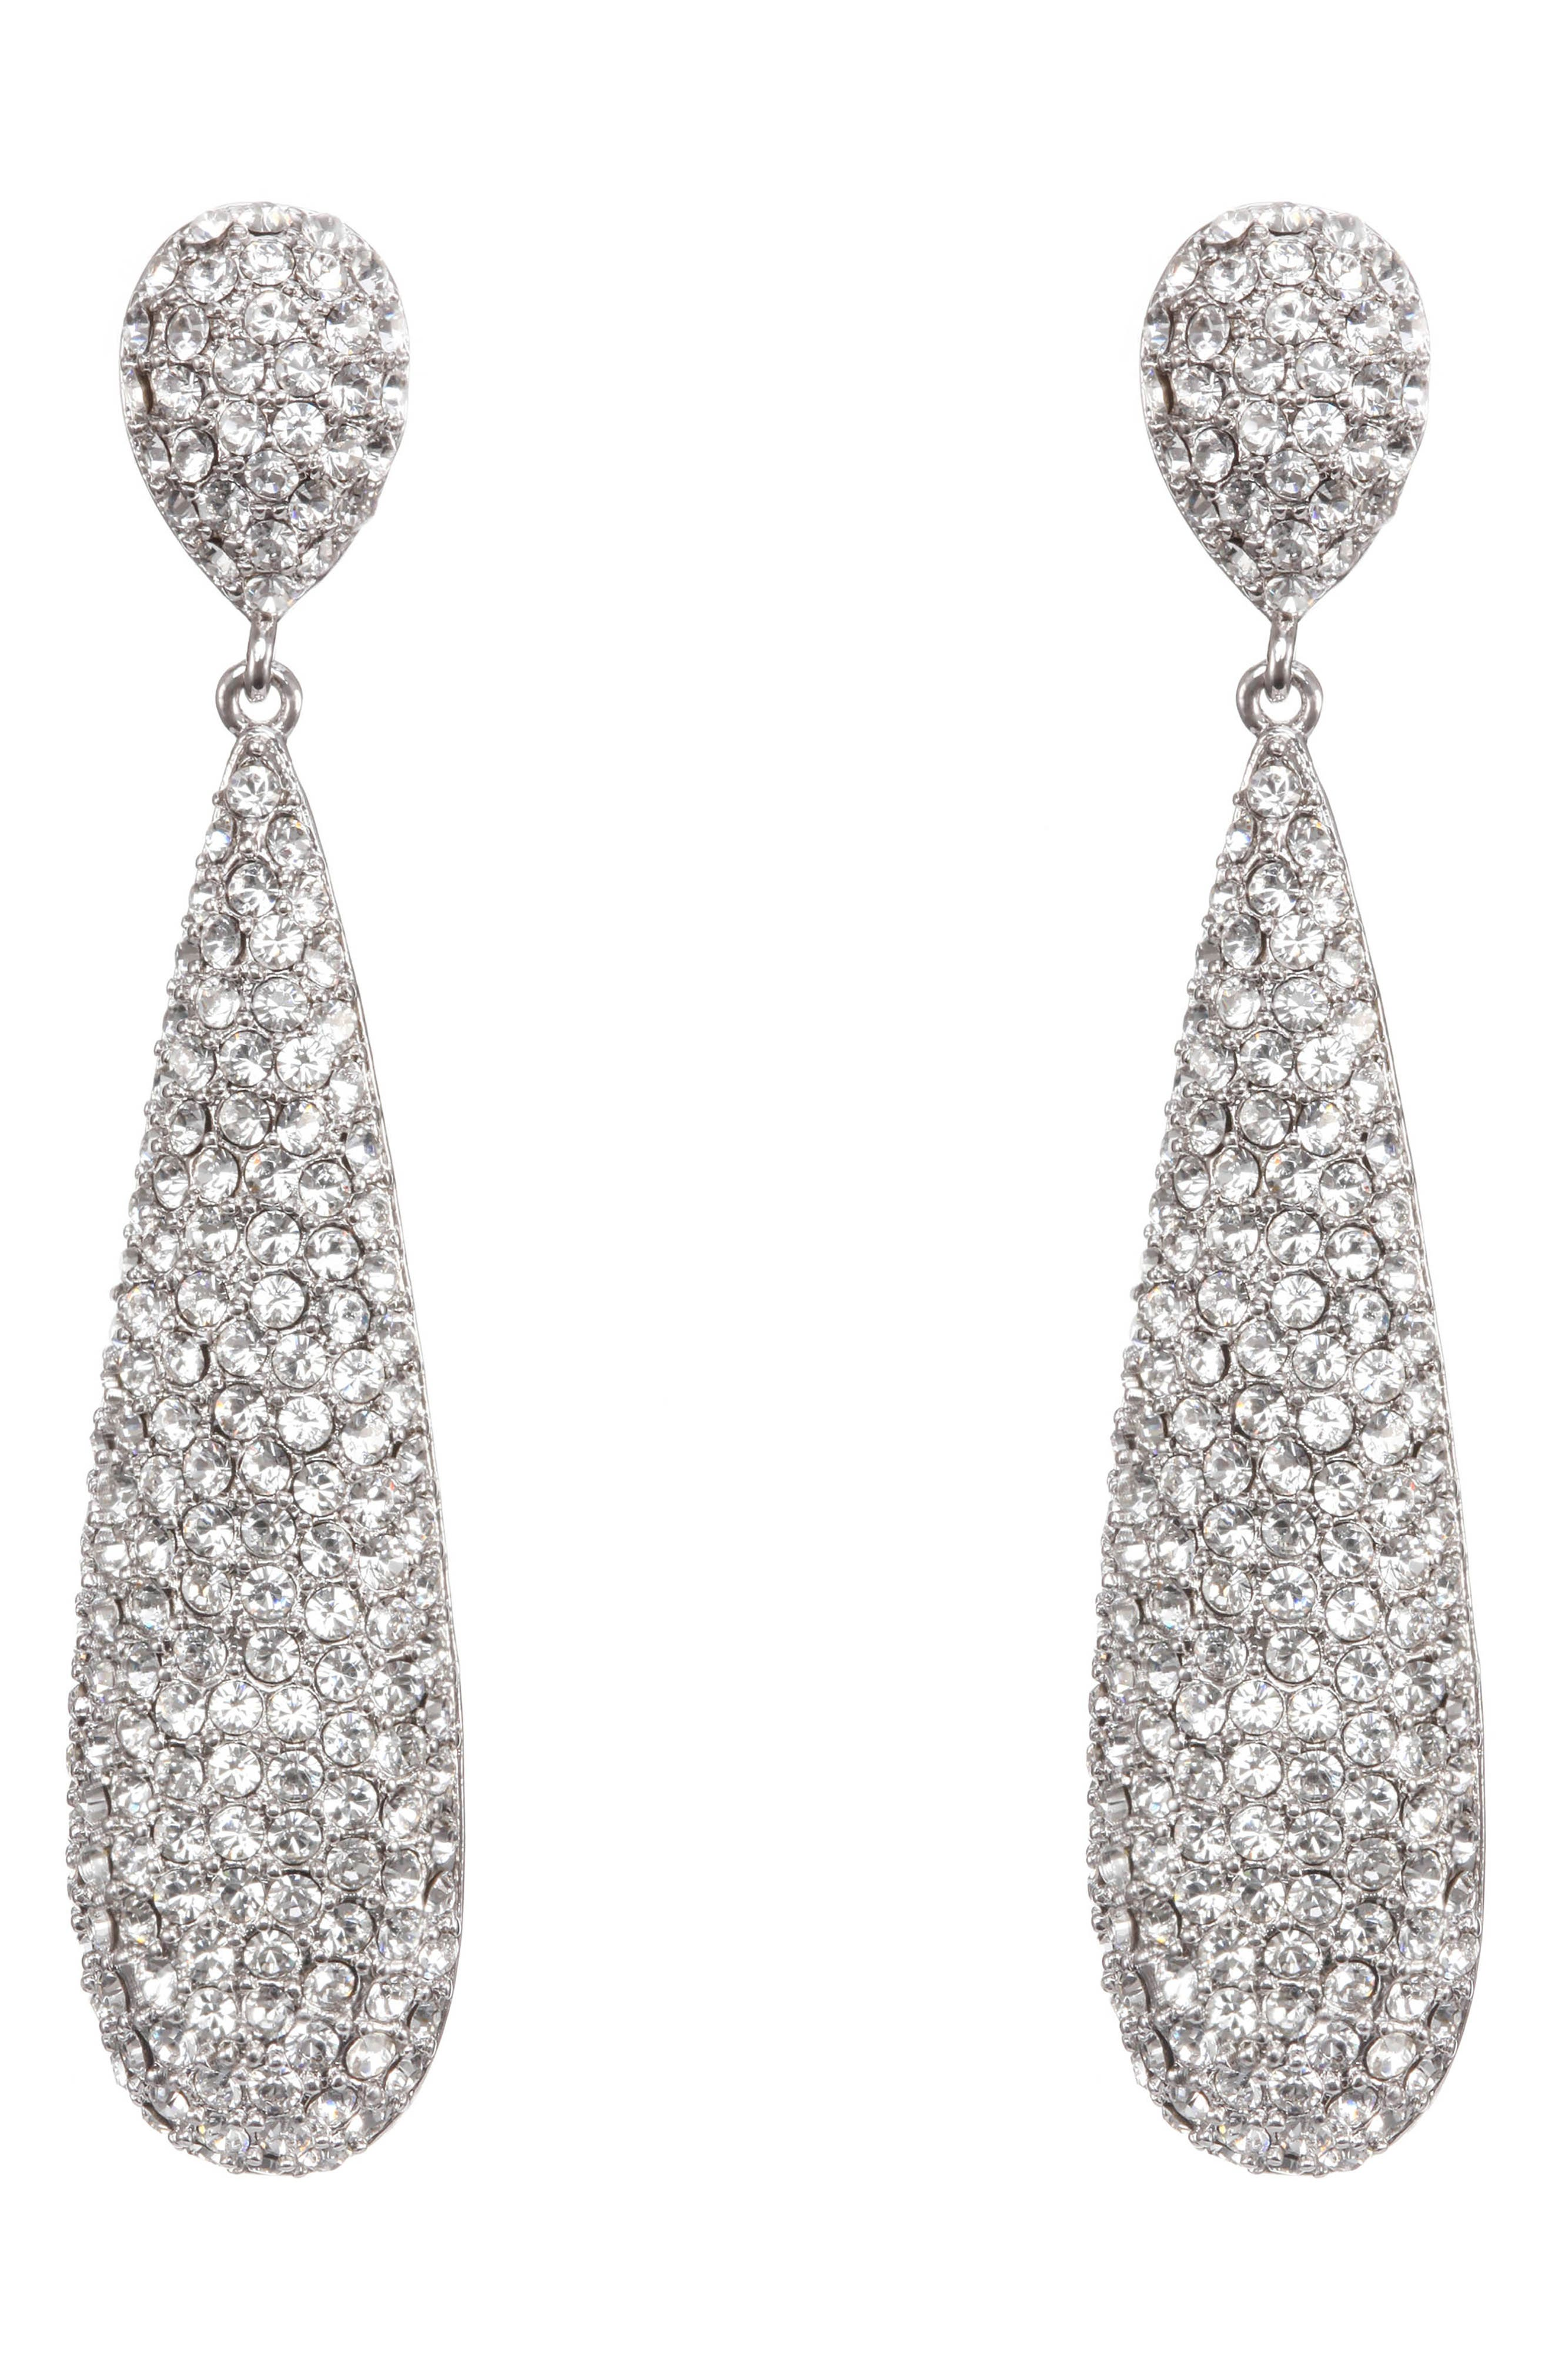 NINA Elongated Pavé Swarovski Crystal Teardrop Earrings, Main, color, WHITE/ SILVER